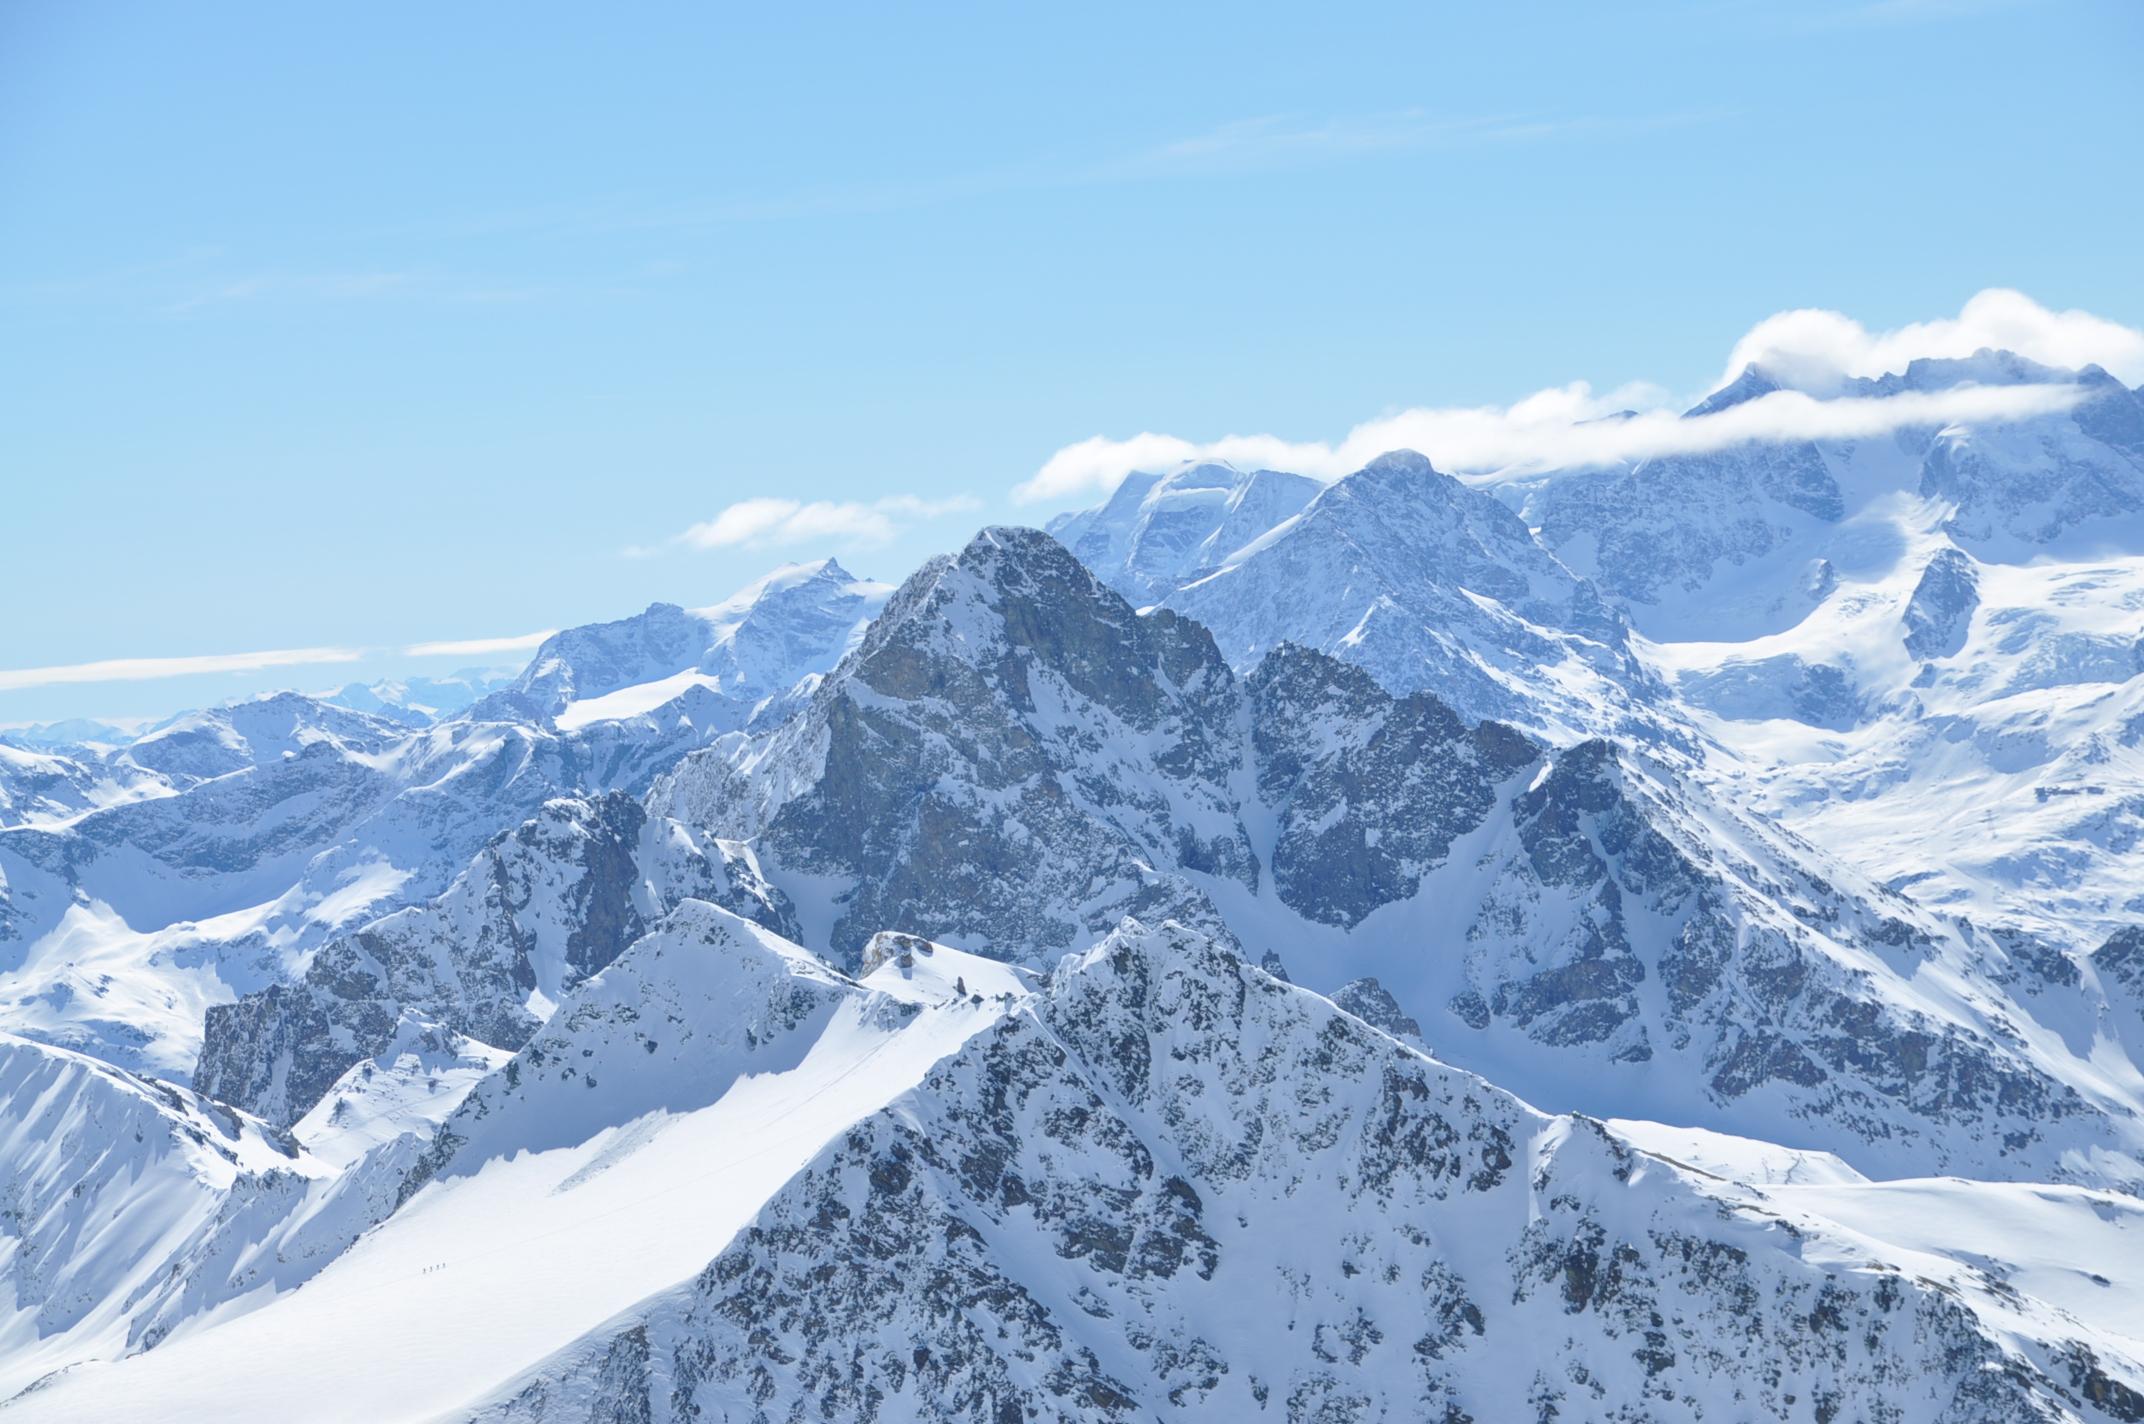 File Piz Surgonda Piz Julier And Bernina Range From